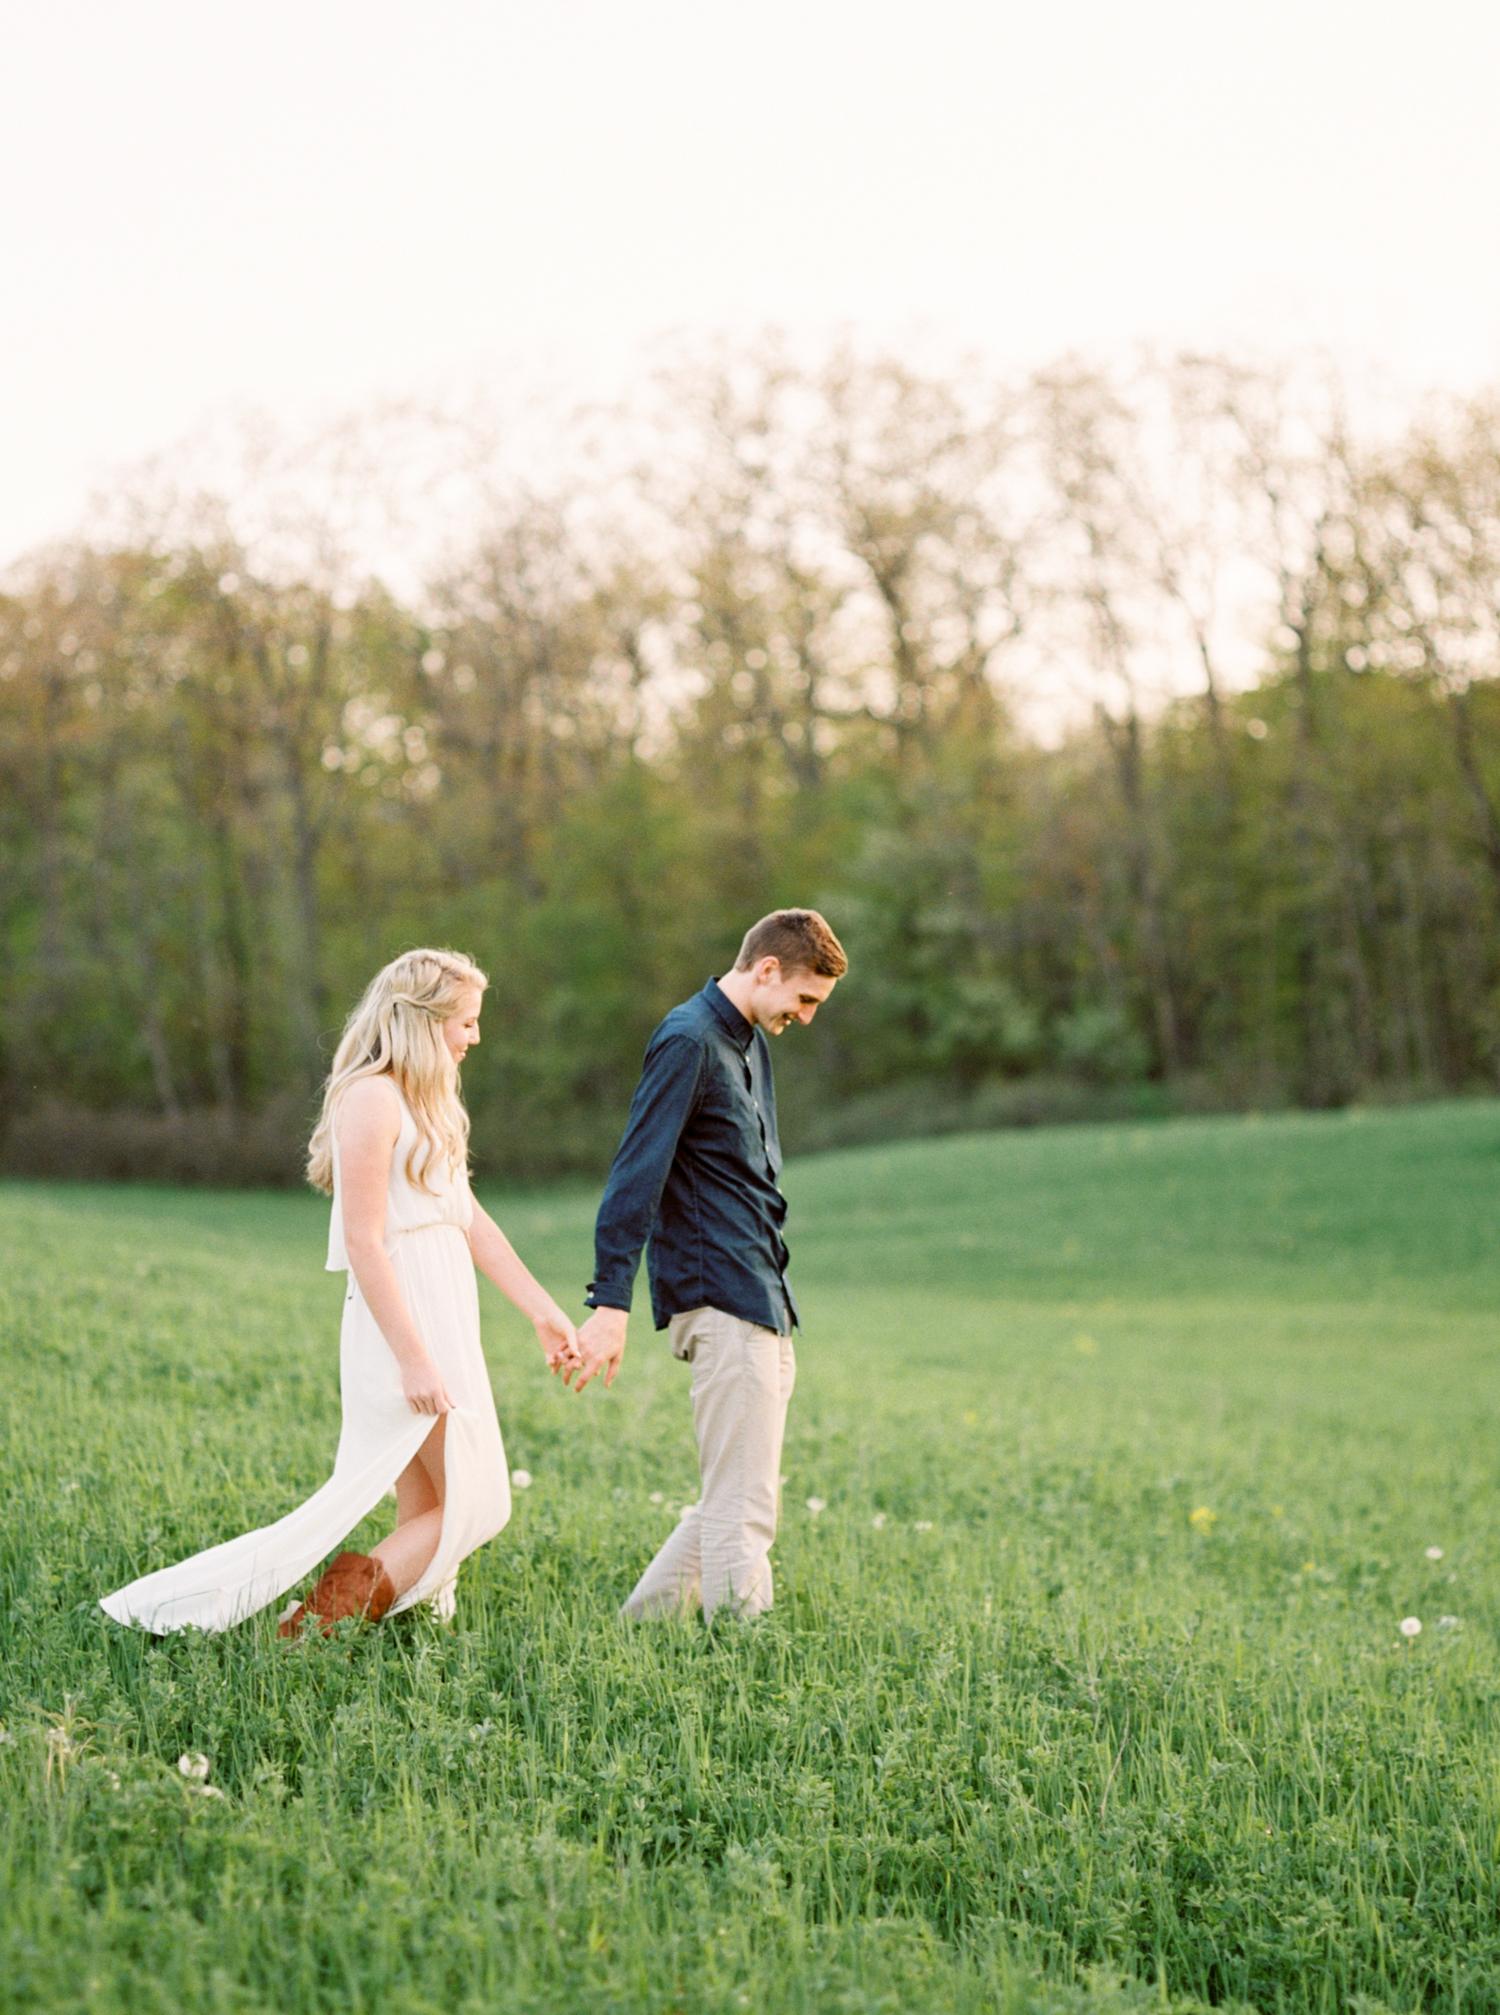 Katie-Nicolle-Niagara-Toronto-Muskoka-Wedding-71.jpg